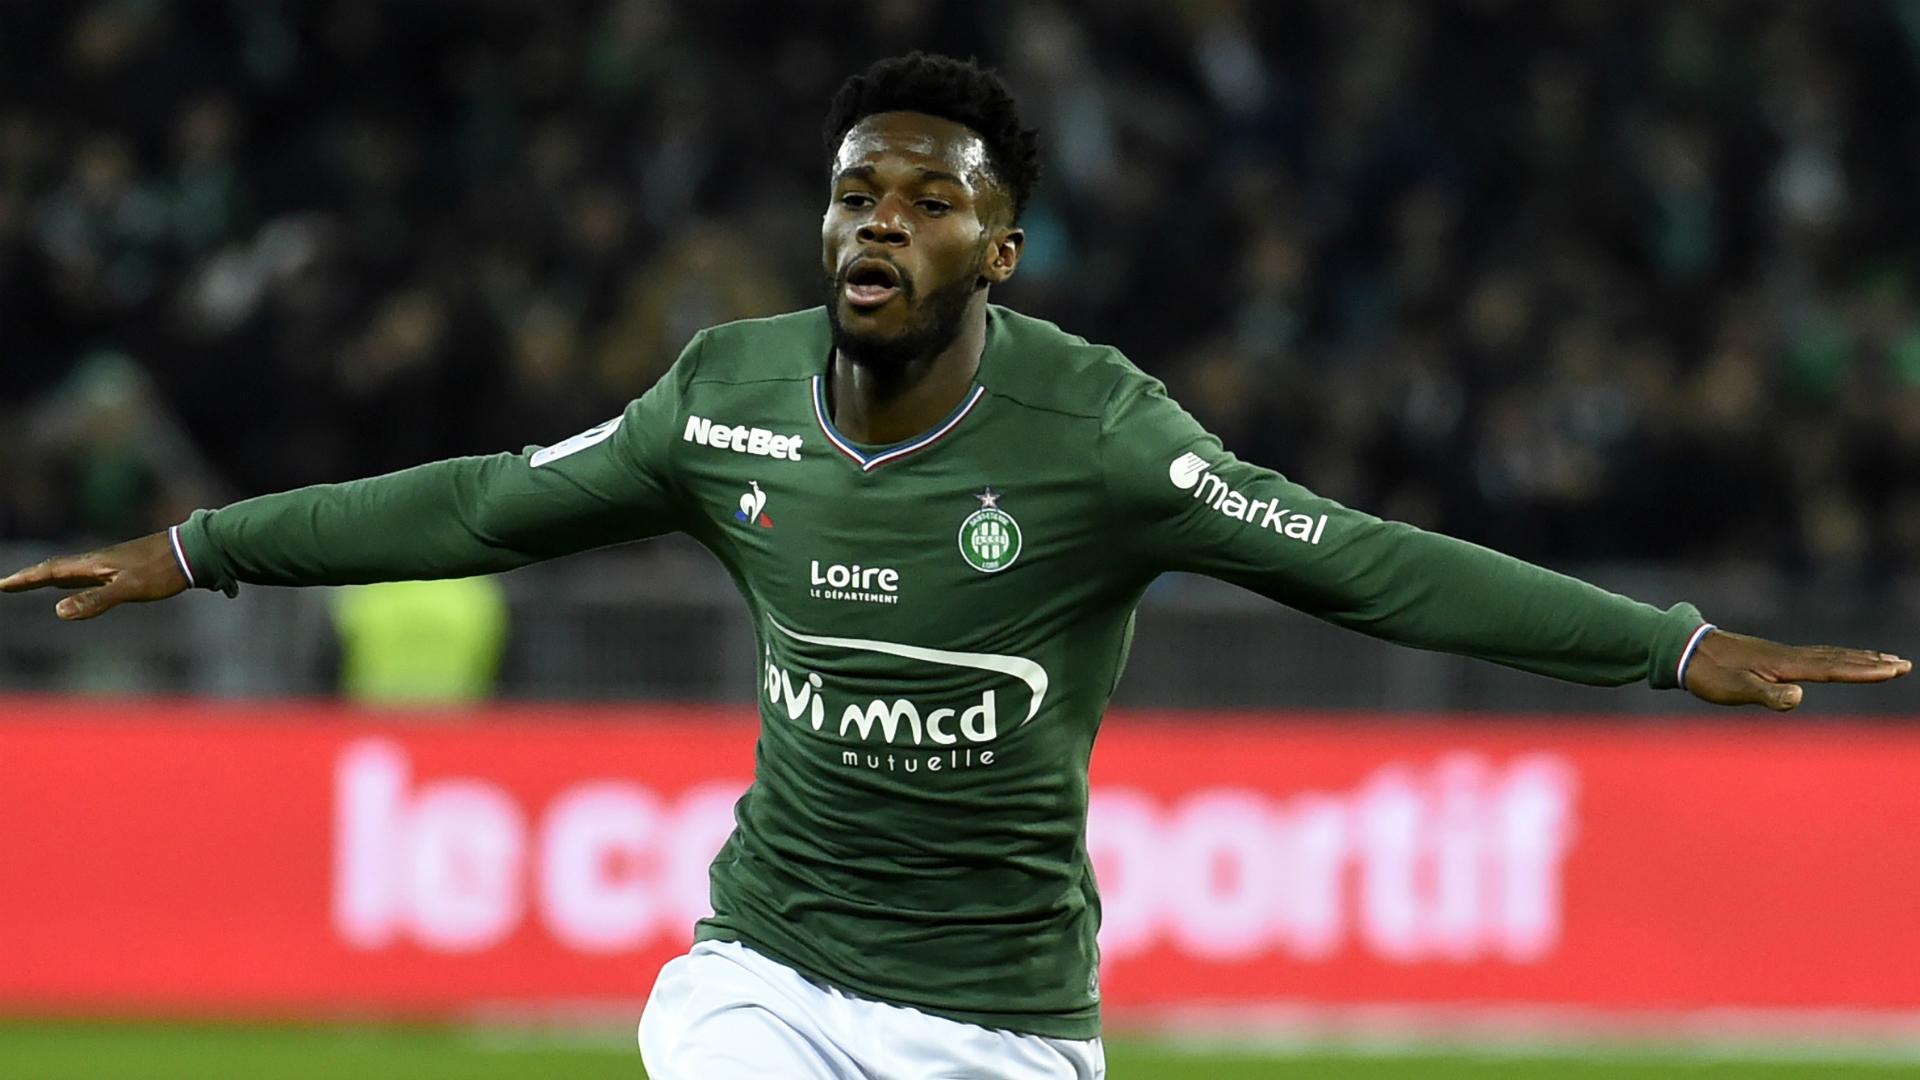 The bargain of the summer transfer window? Meet Ligue 1 Rising Star Jonathan Bamba | Goal.com